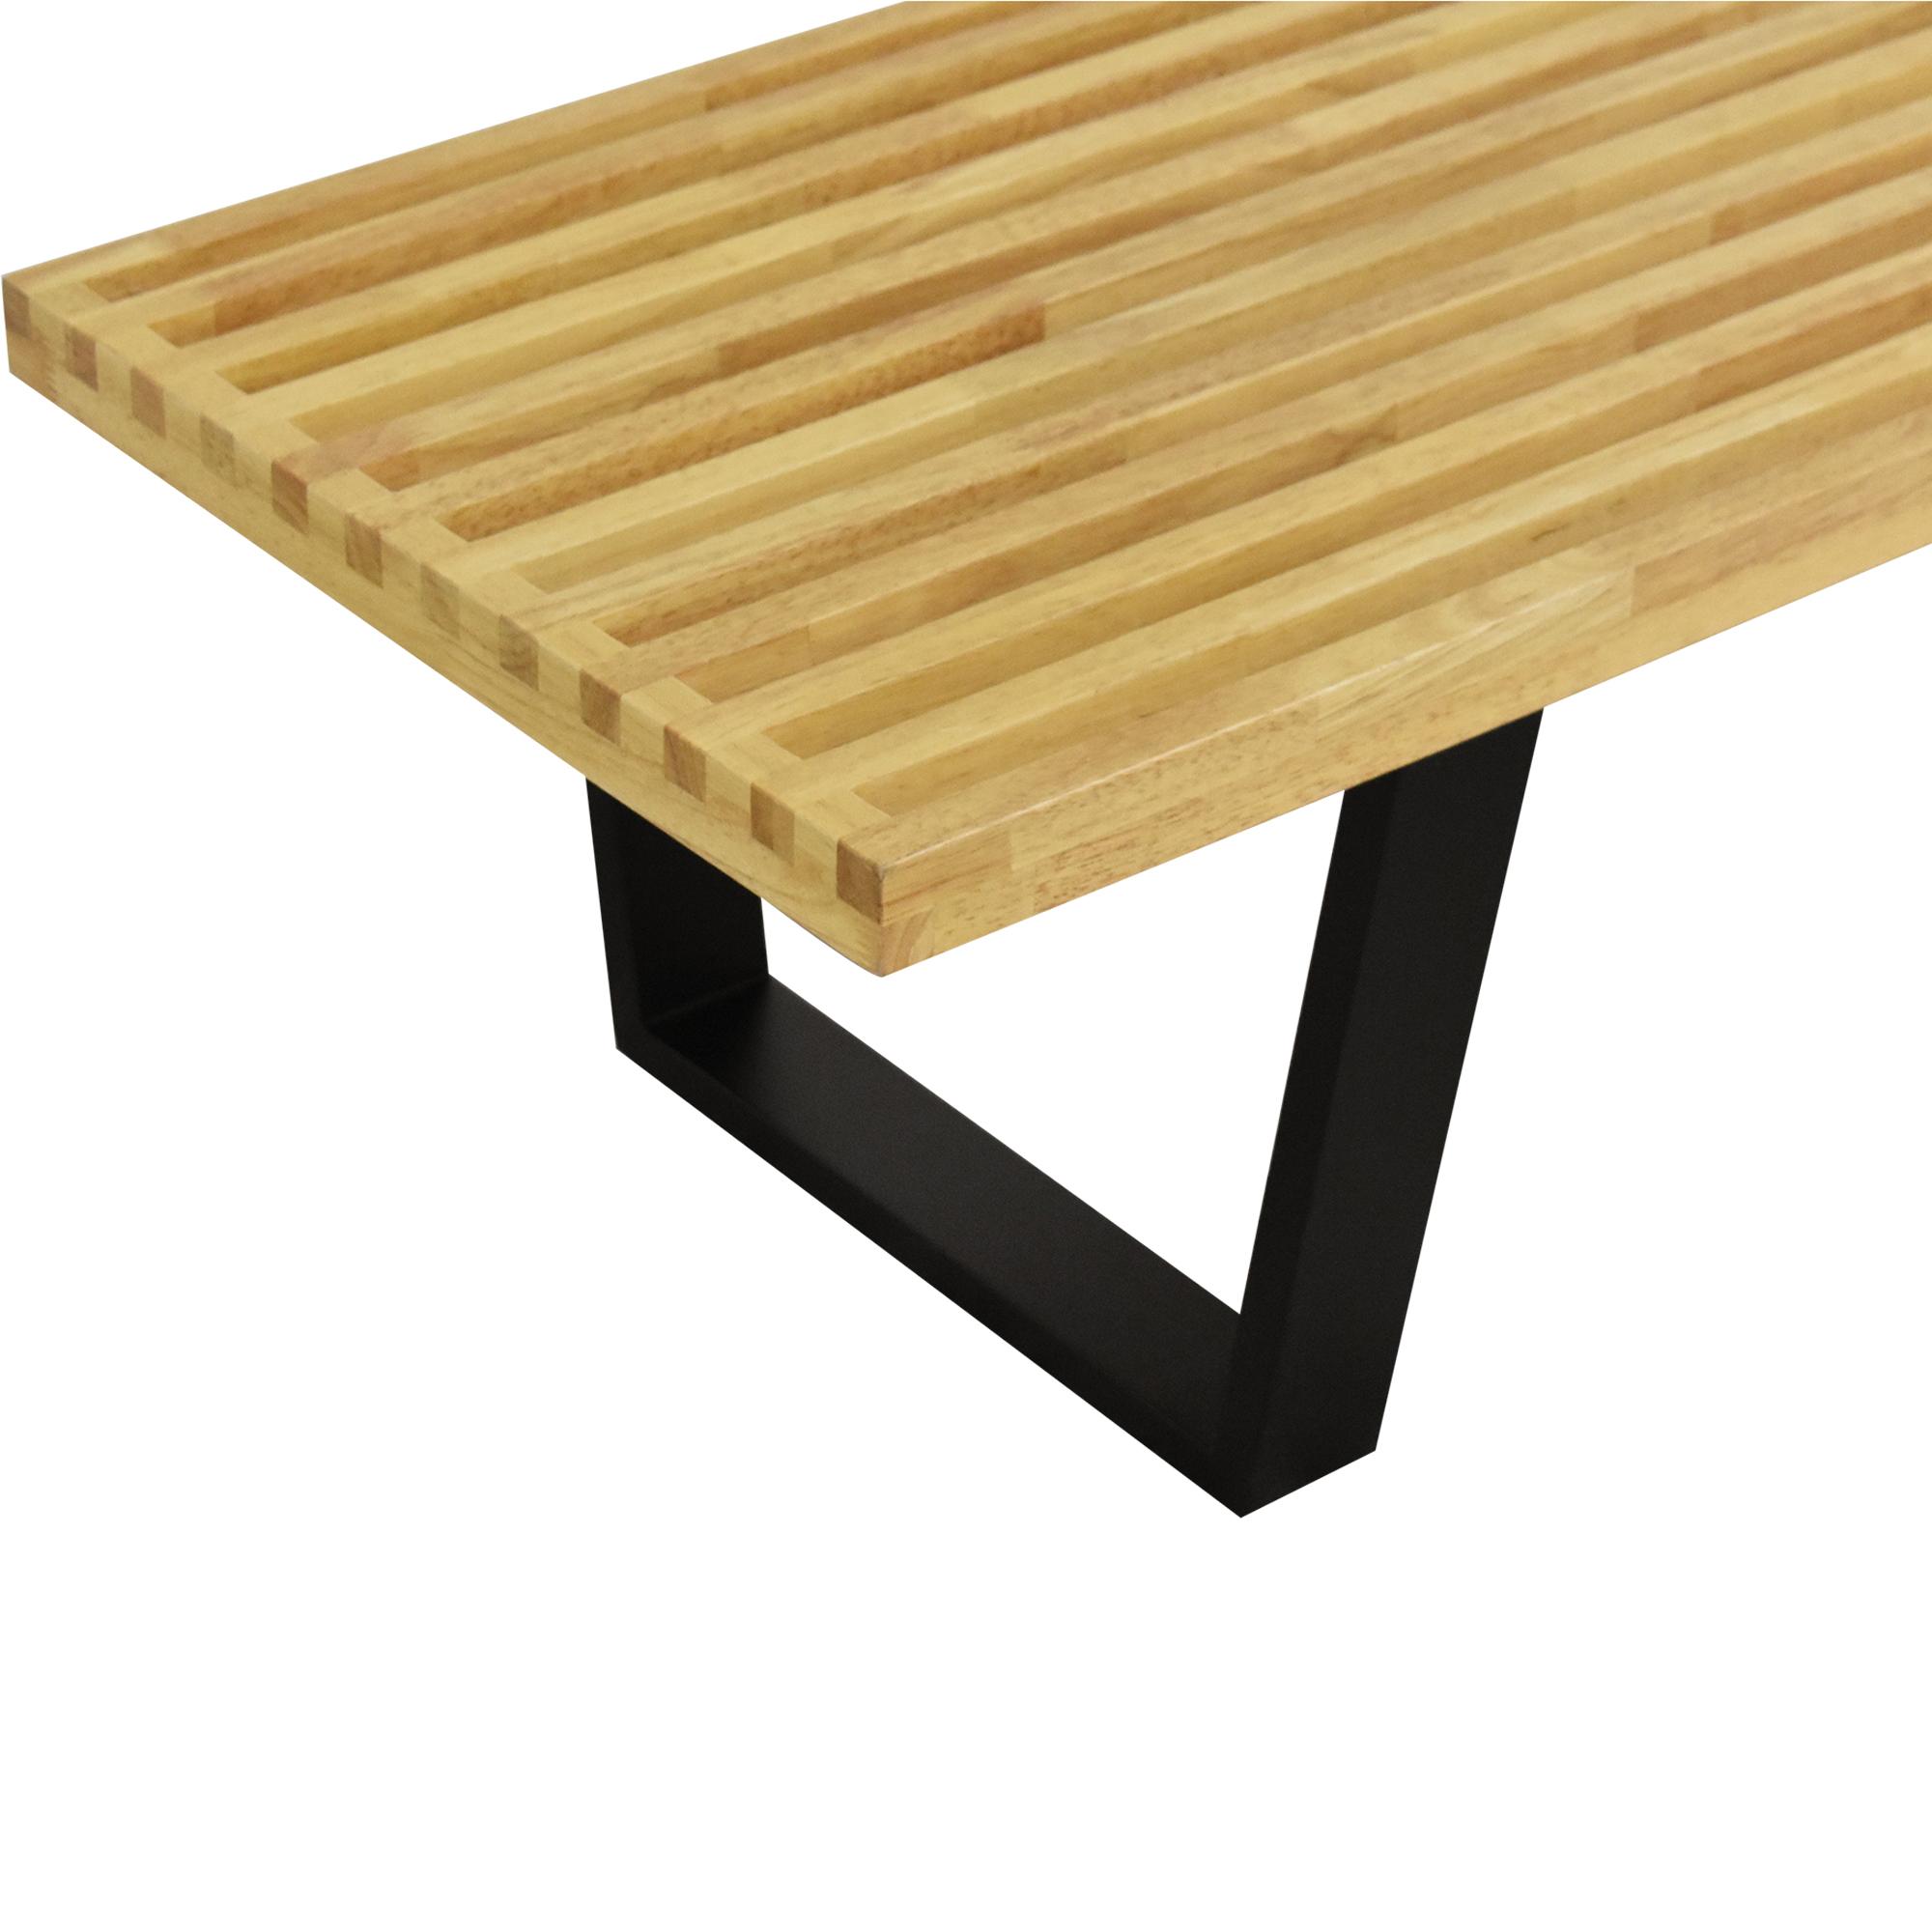 Nelson-Style Platform Bench